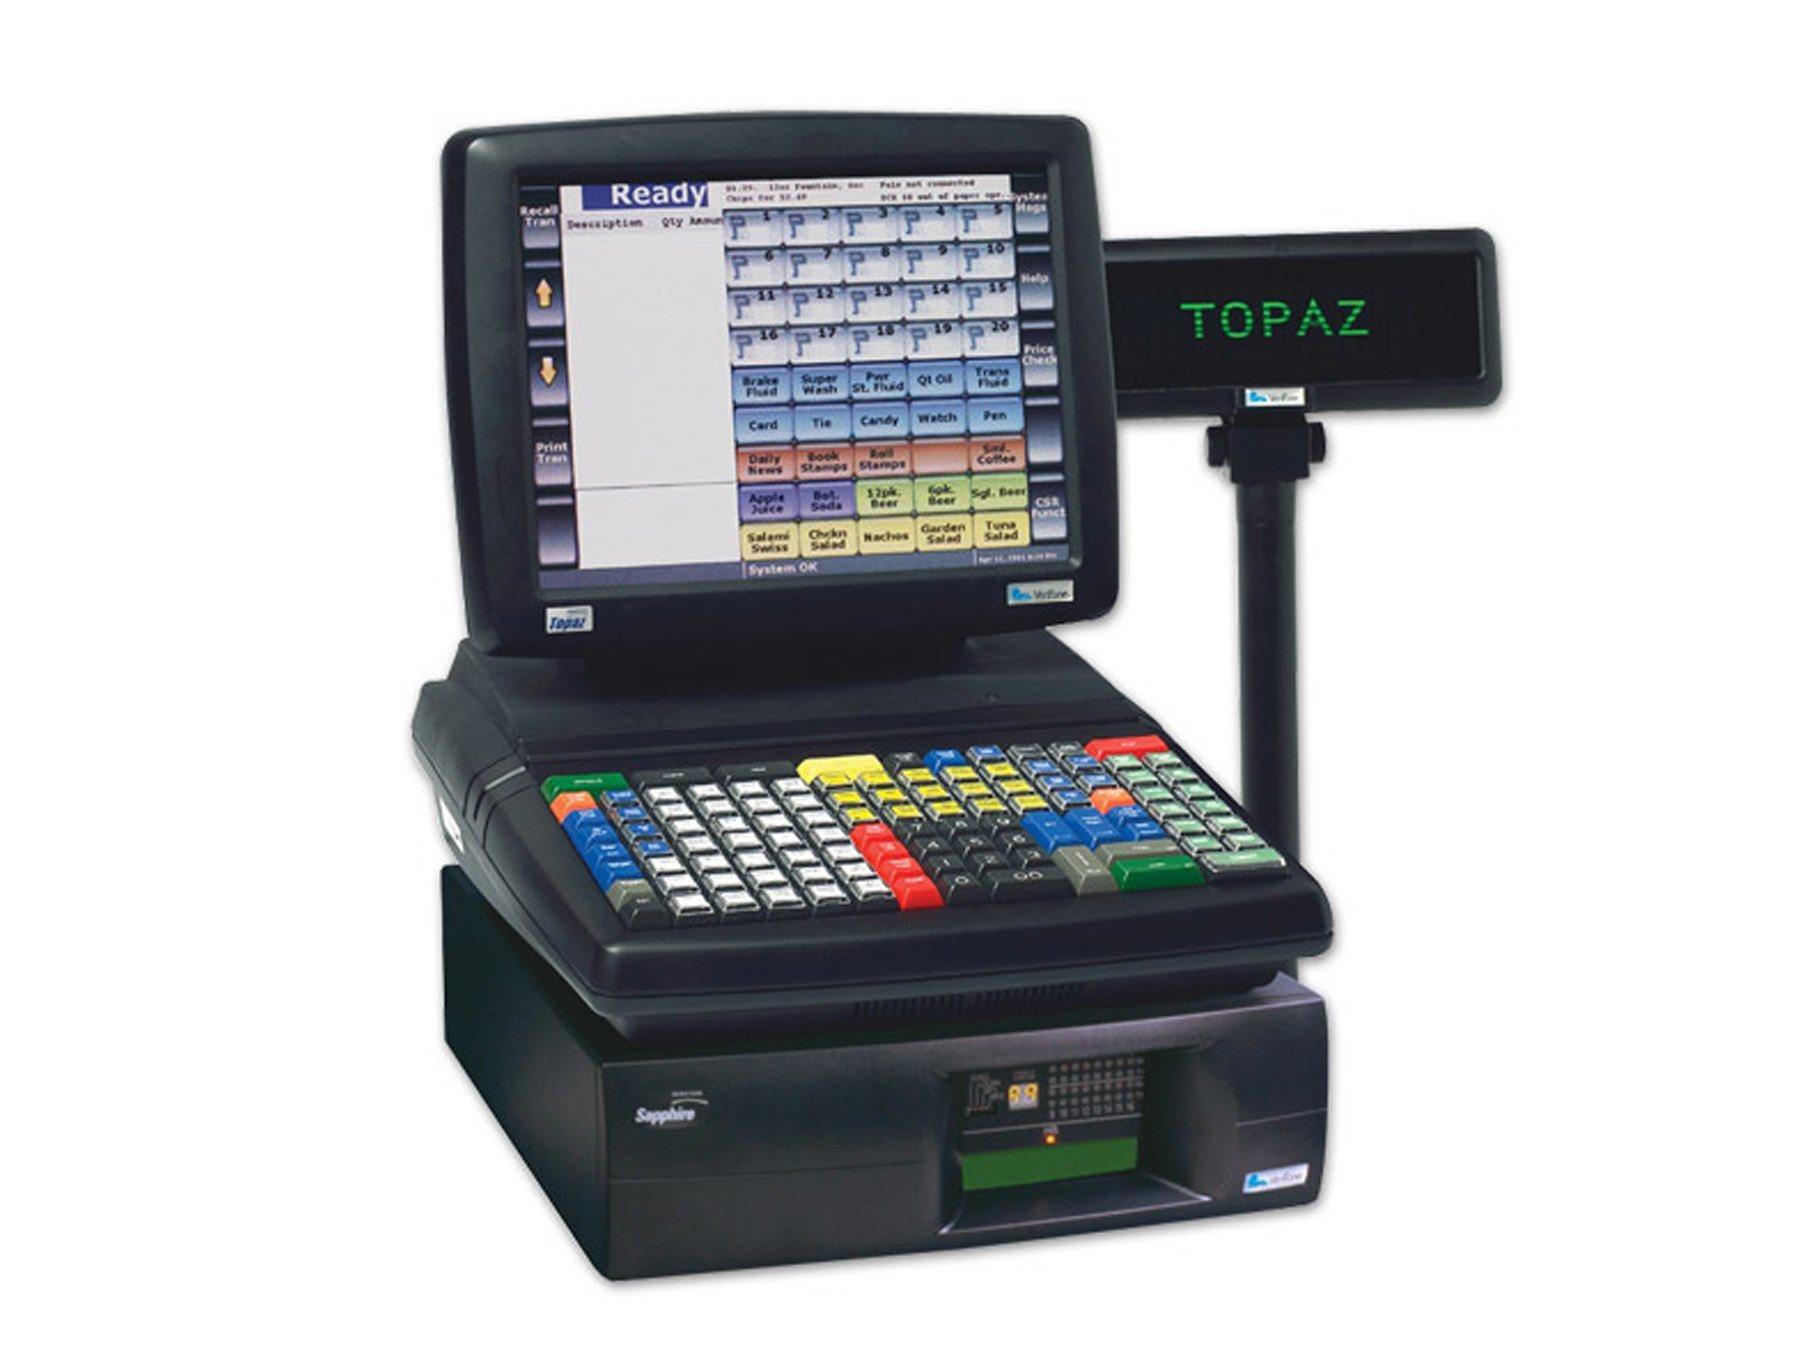 Topaz Sapphire Pos System